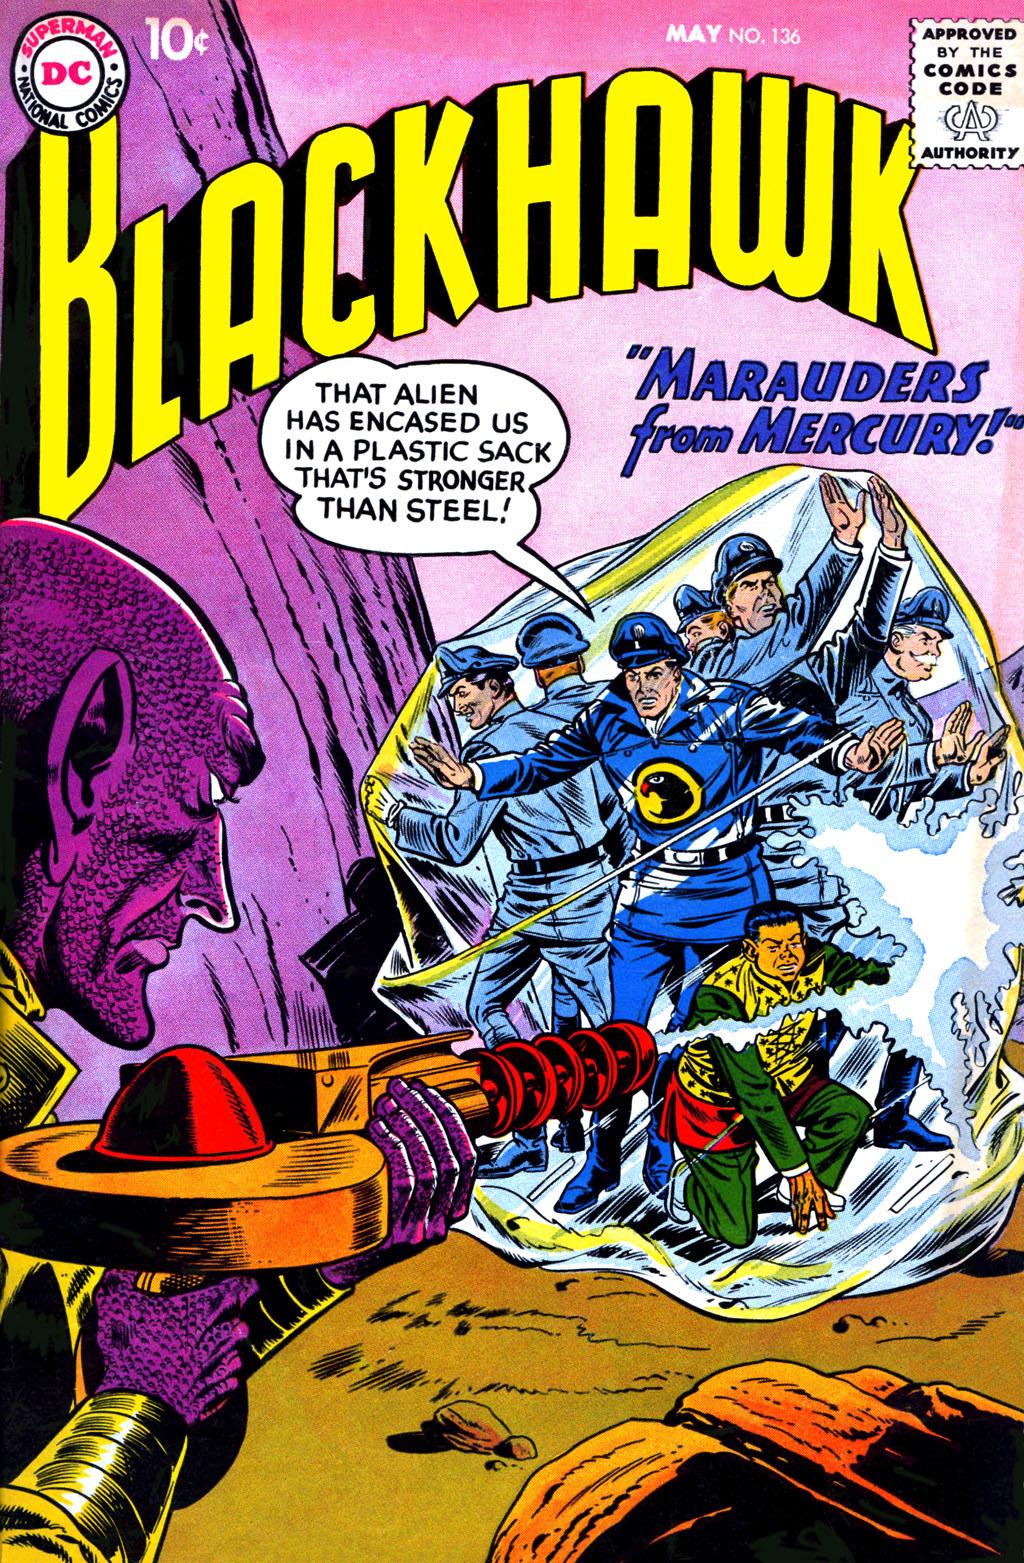 Blackhawk (1957) 136 Page 1